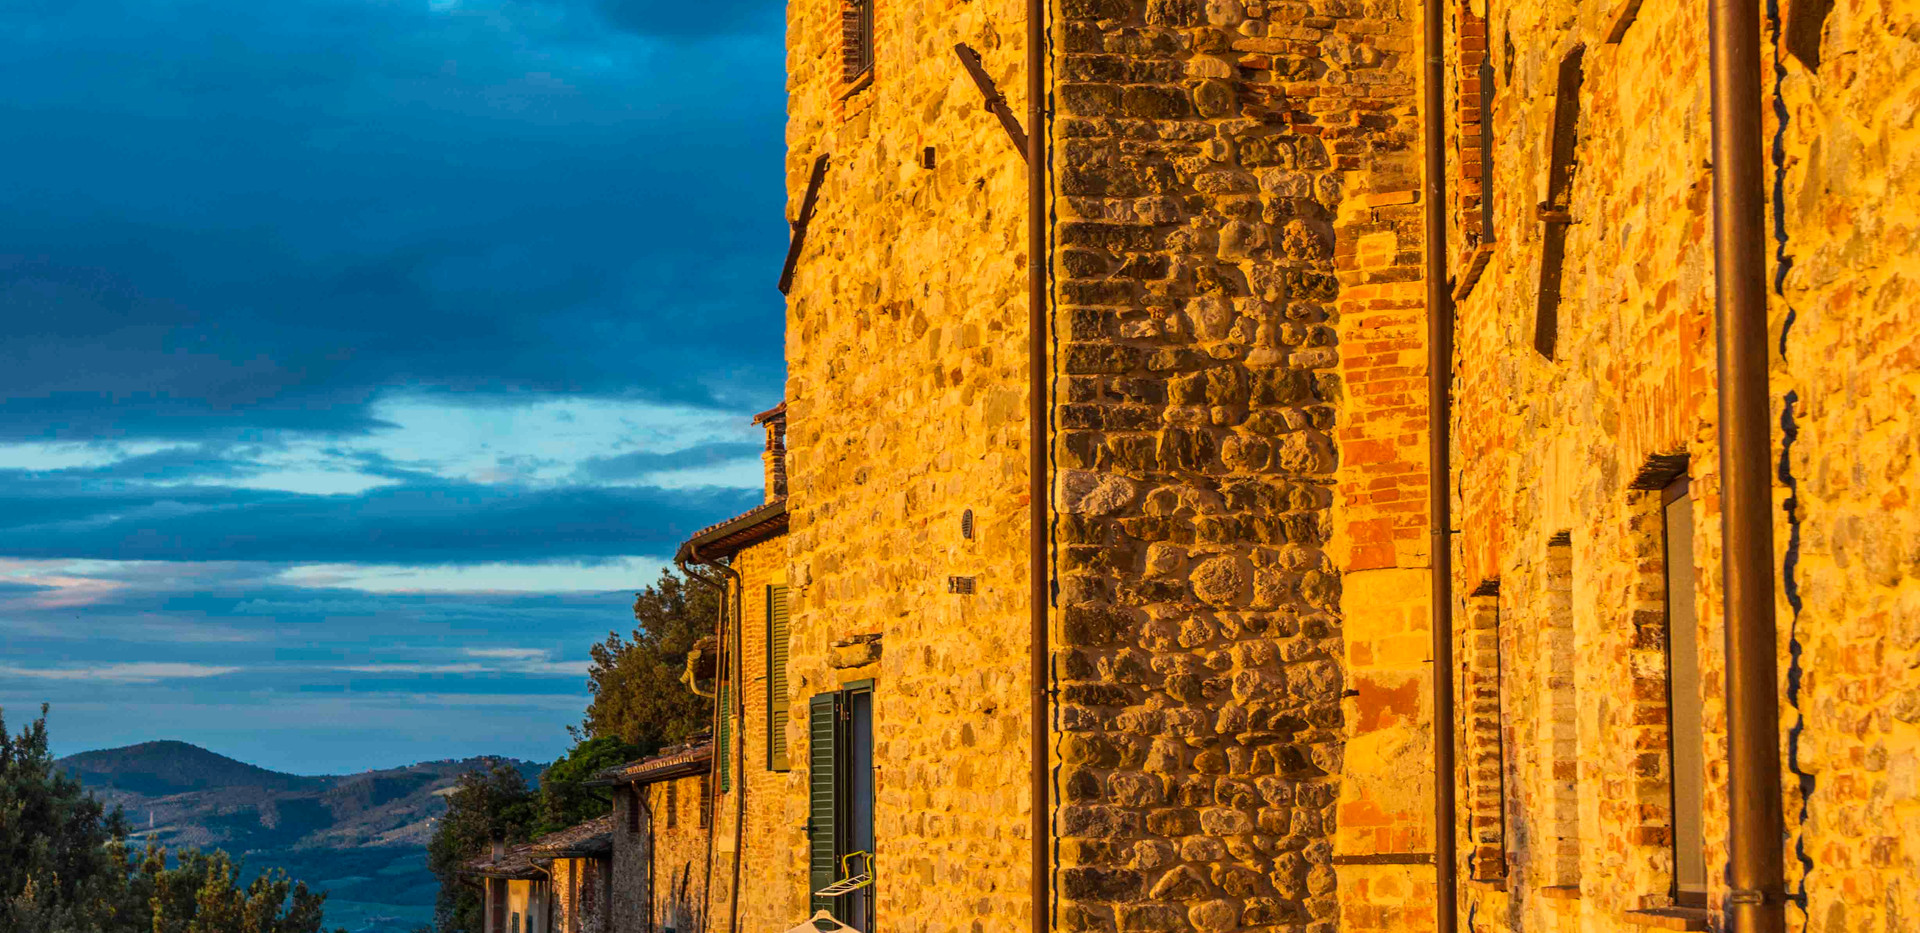 Piegaro wall sunset